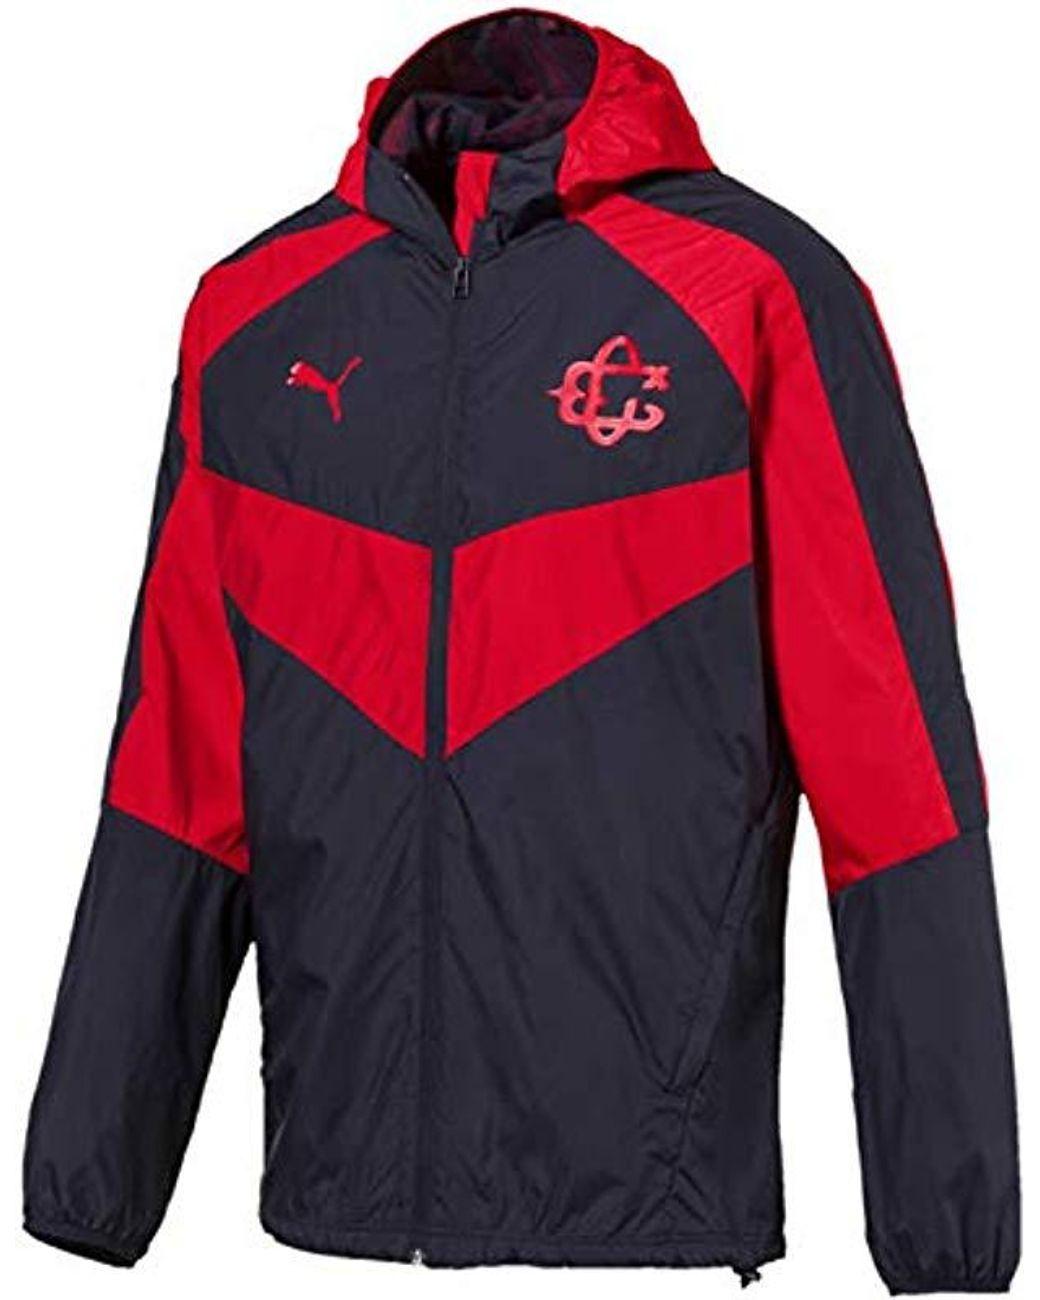 dcc5caa4b43a3 Men's Red Chivas Light Weight Jacket